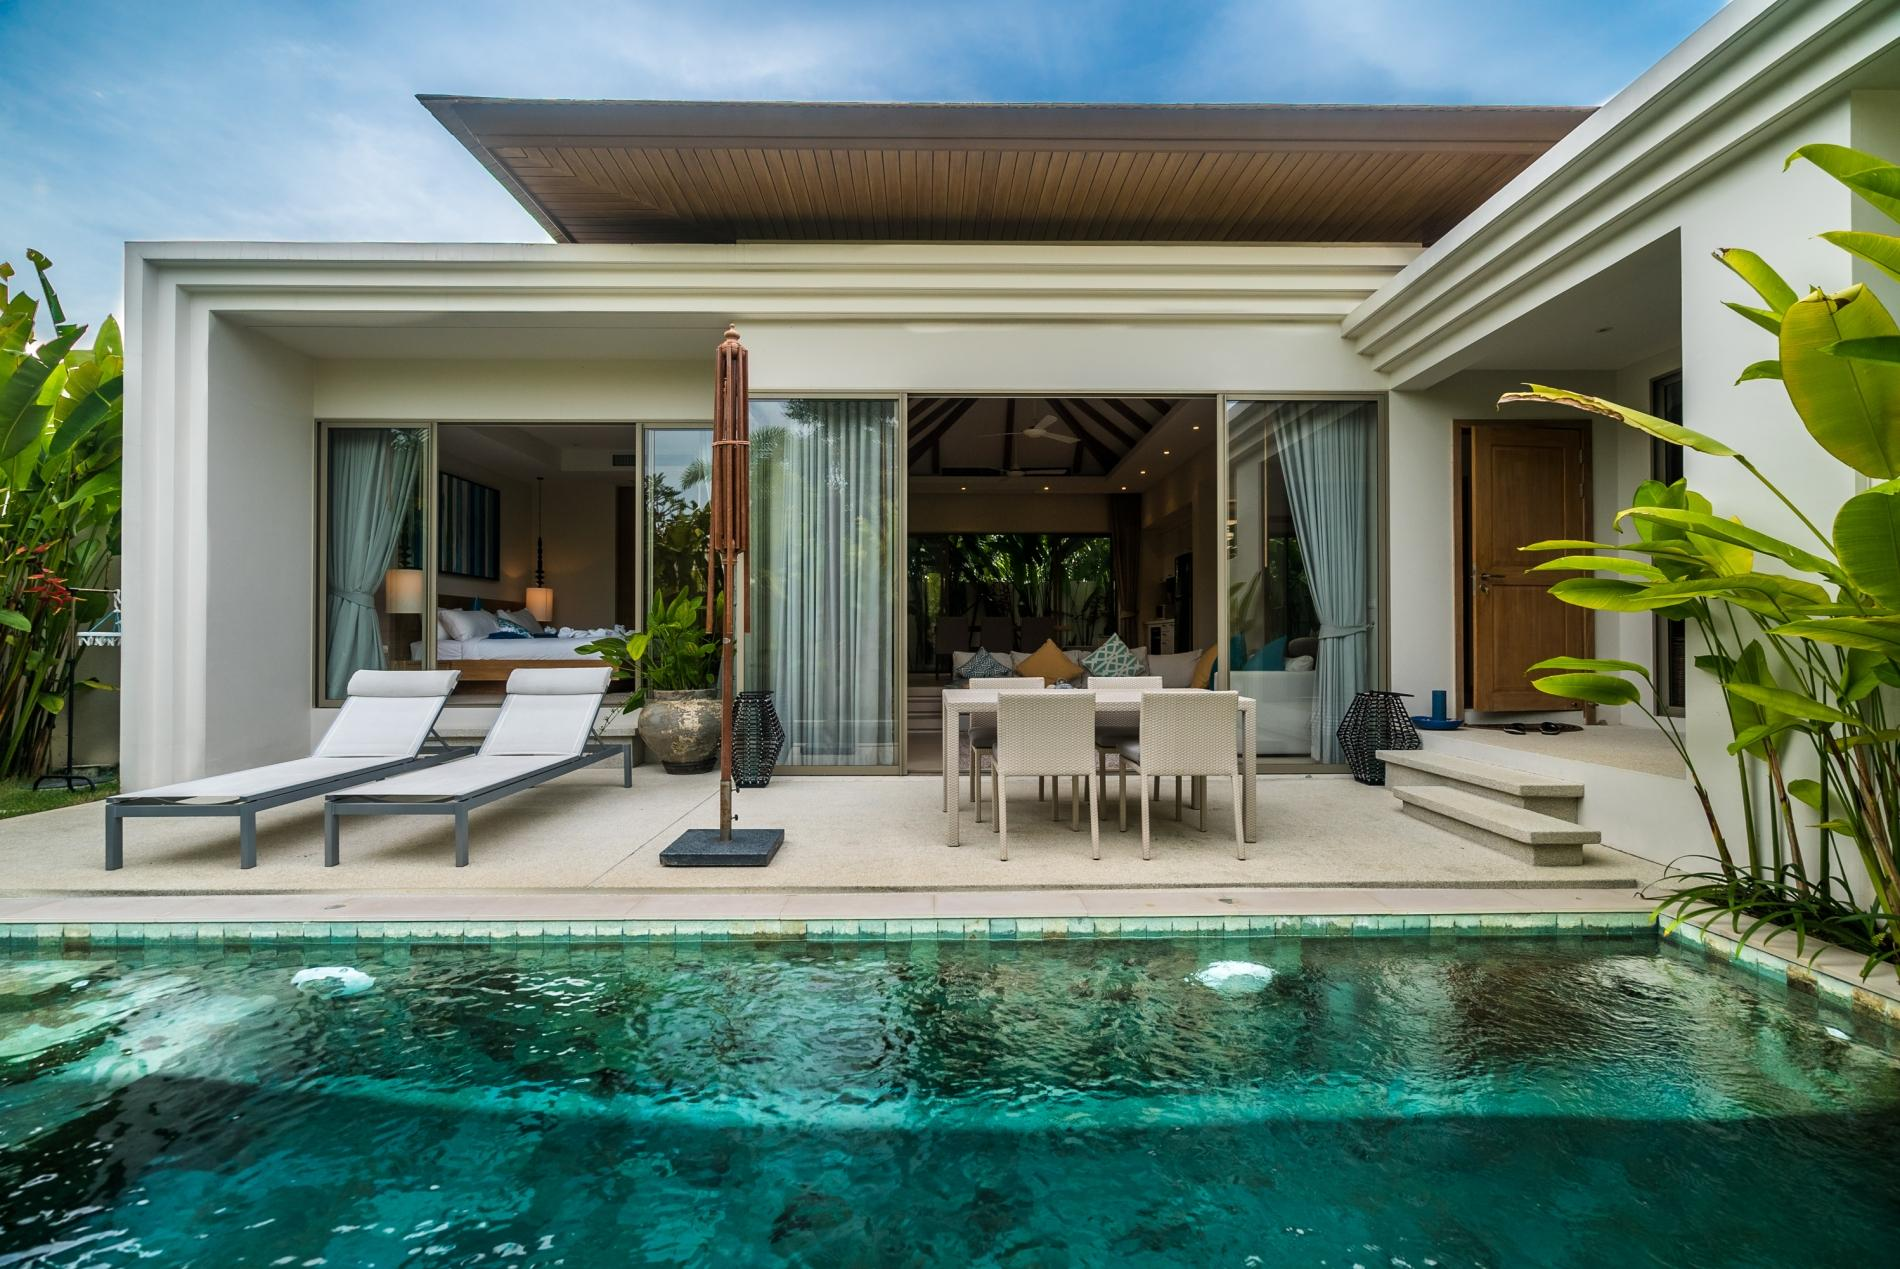 Apartment Trichada 18 - Private pool modern 3 bedroom villa photo 18534013